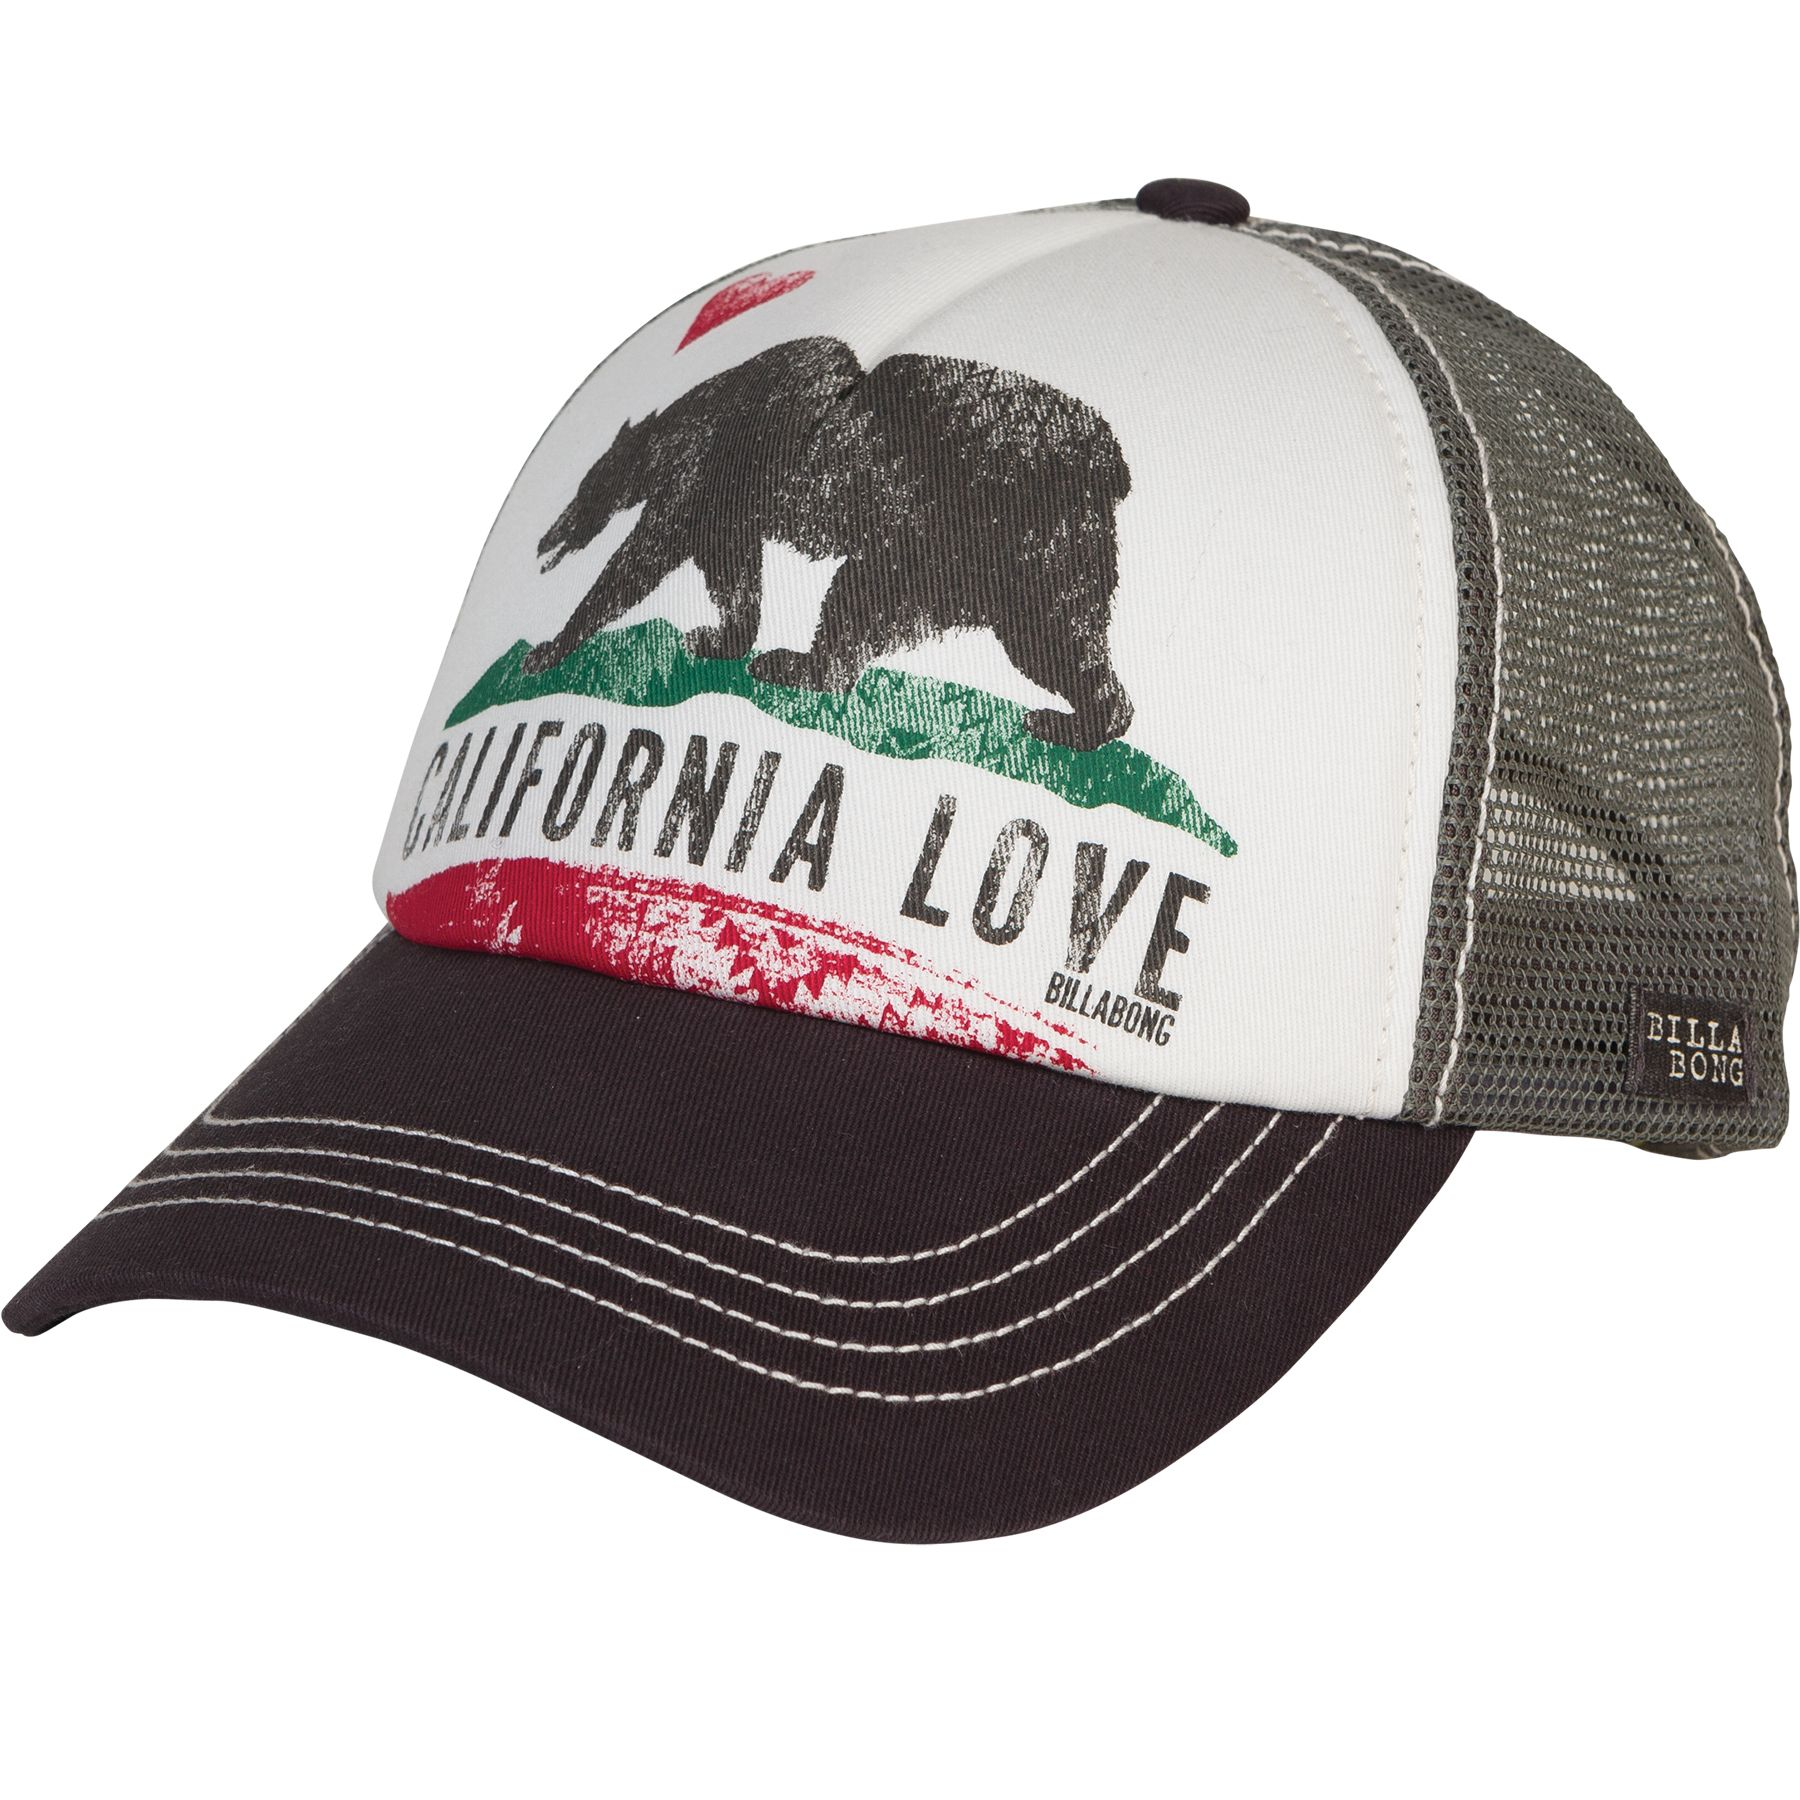 9da20f371b0 Billabong Pitstop Trucker Hat - Charcoal - JAHT1PIT